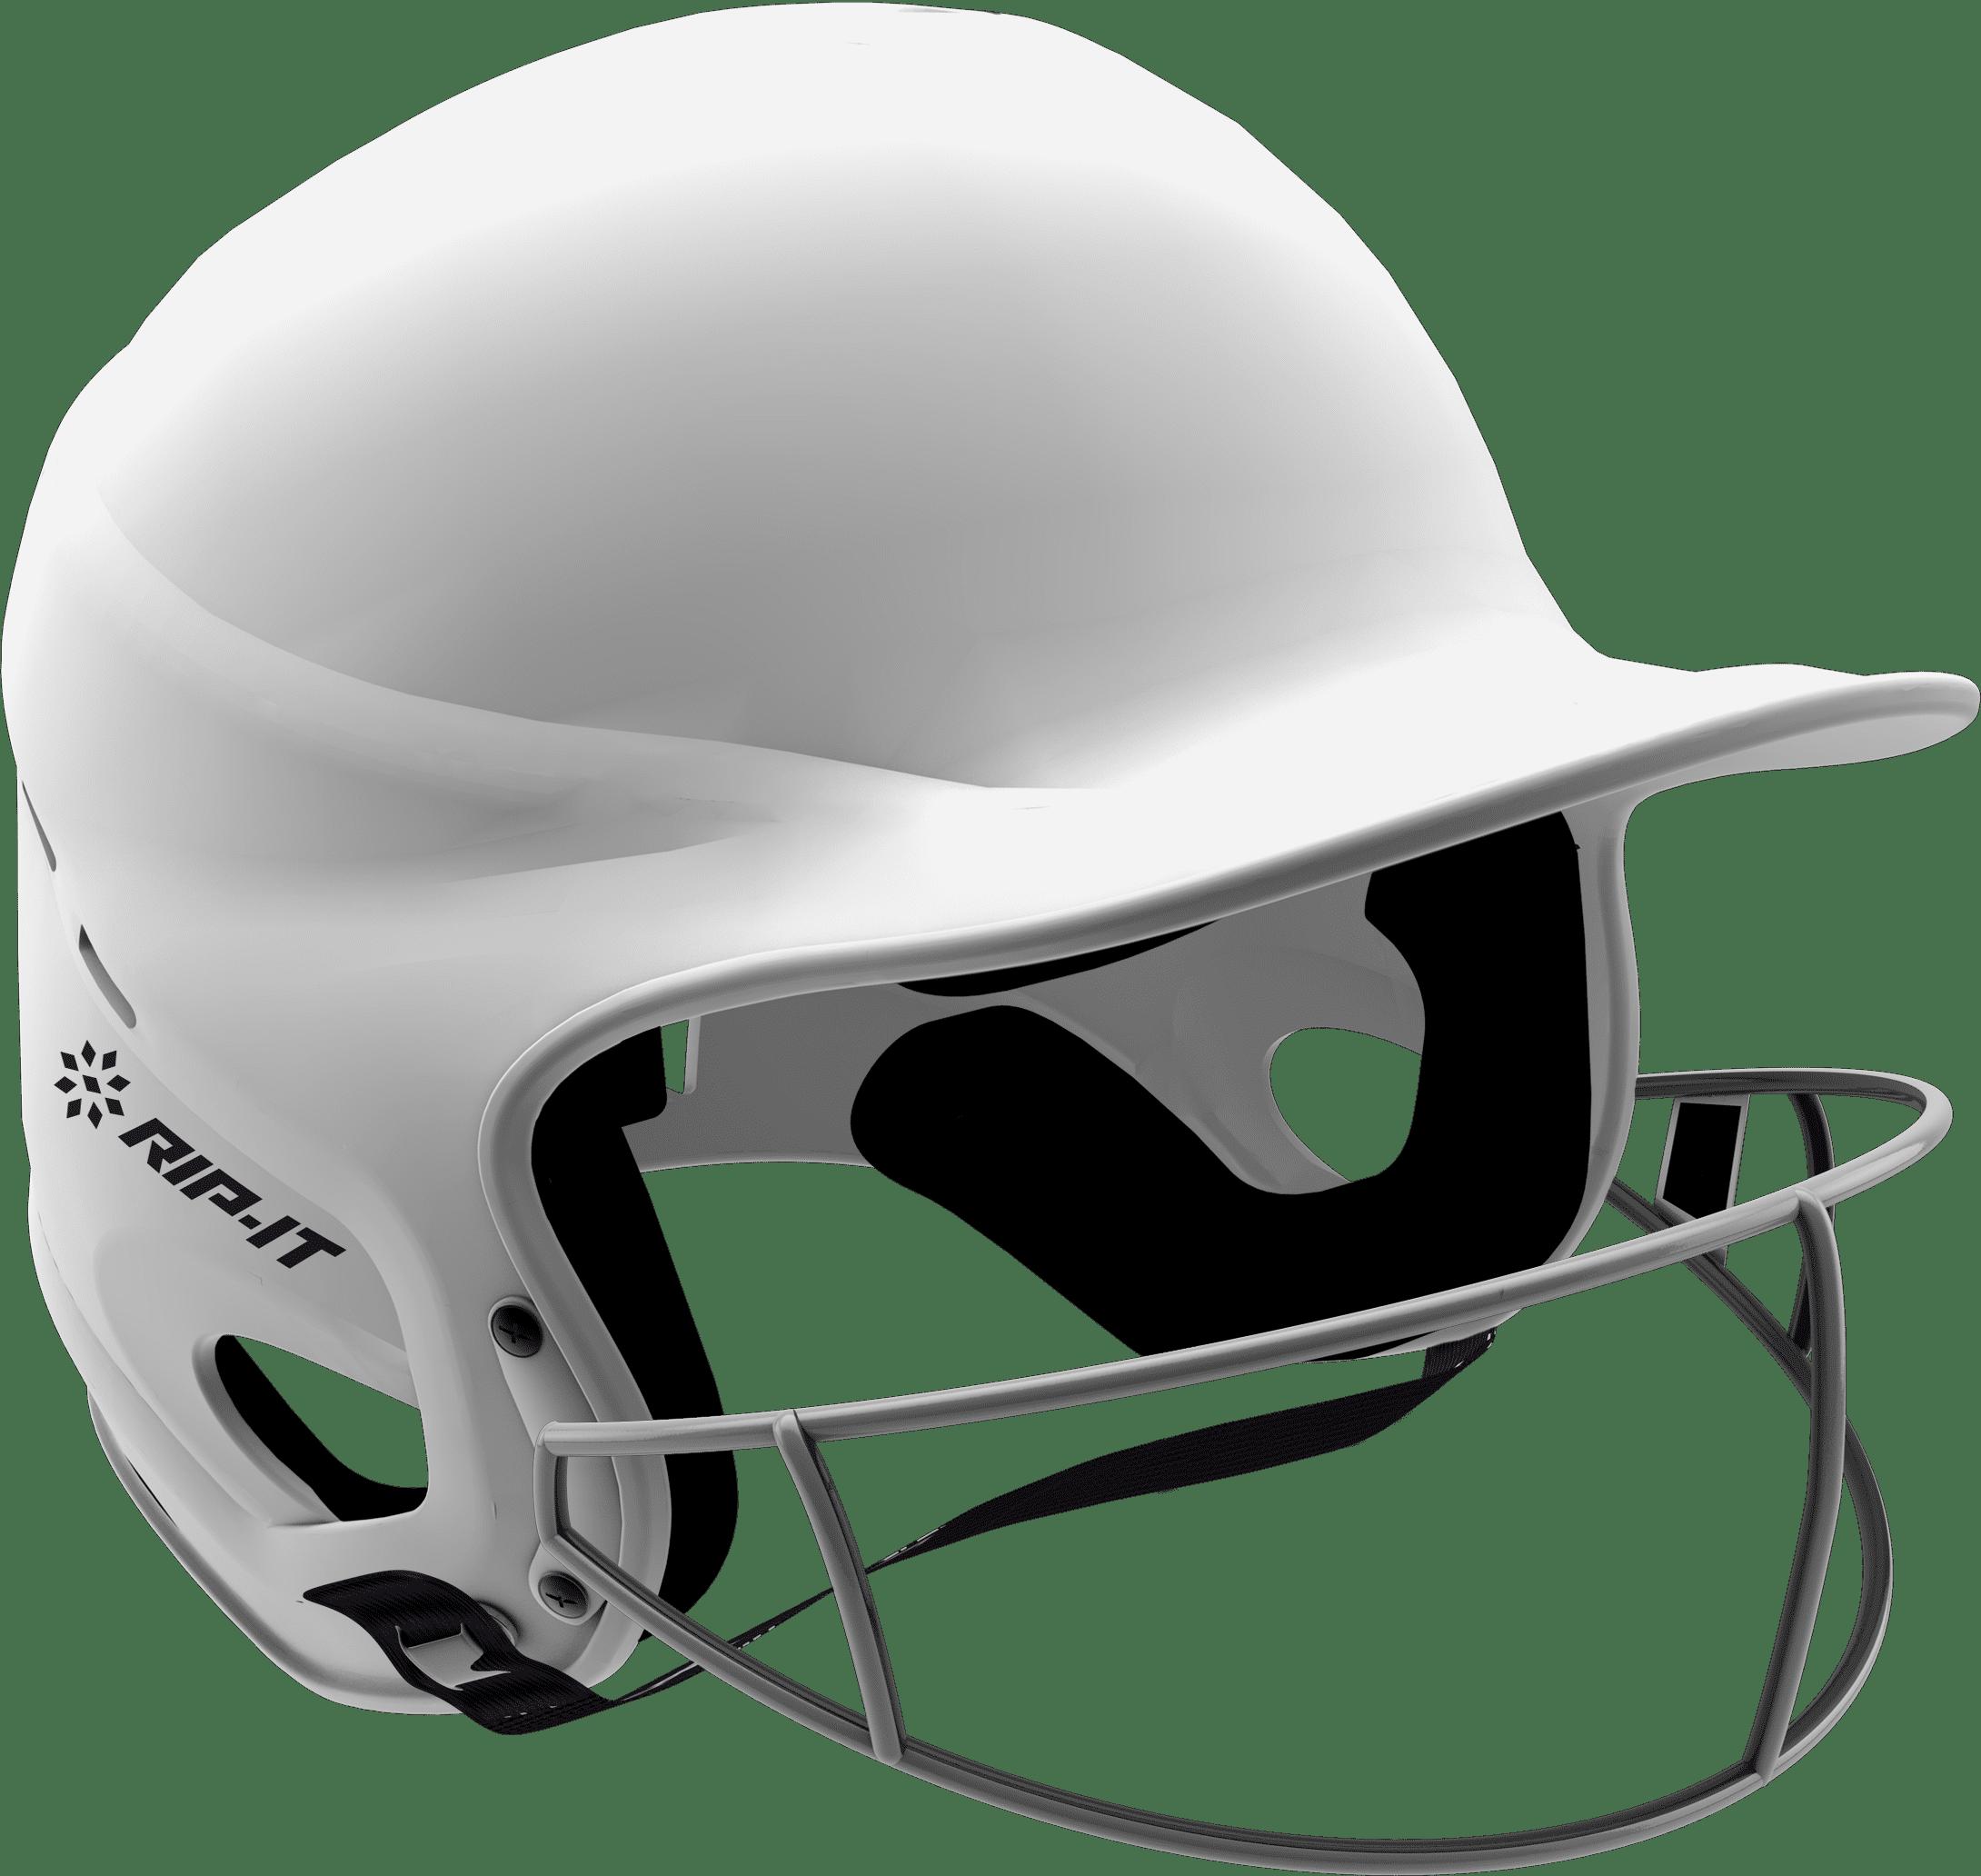 RIP-IT Vision Pro Away Softball Helmet